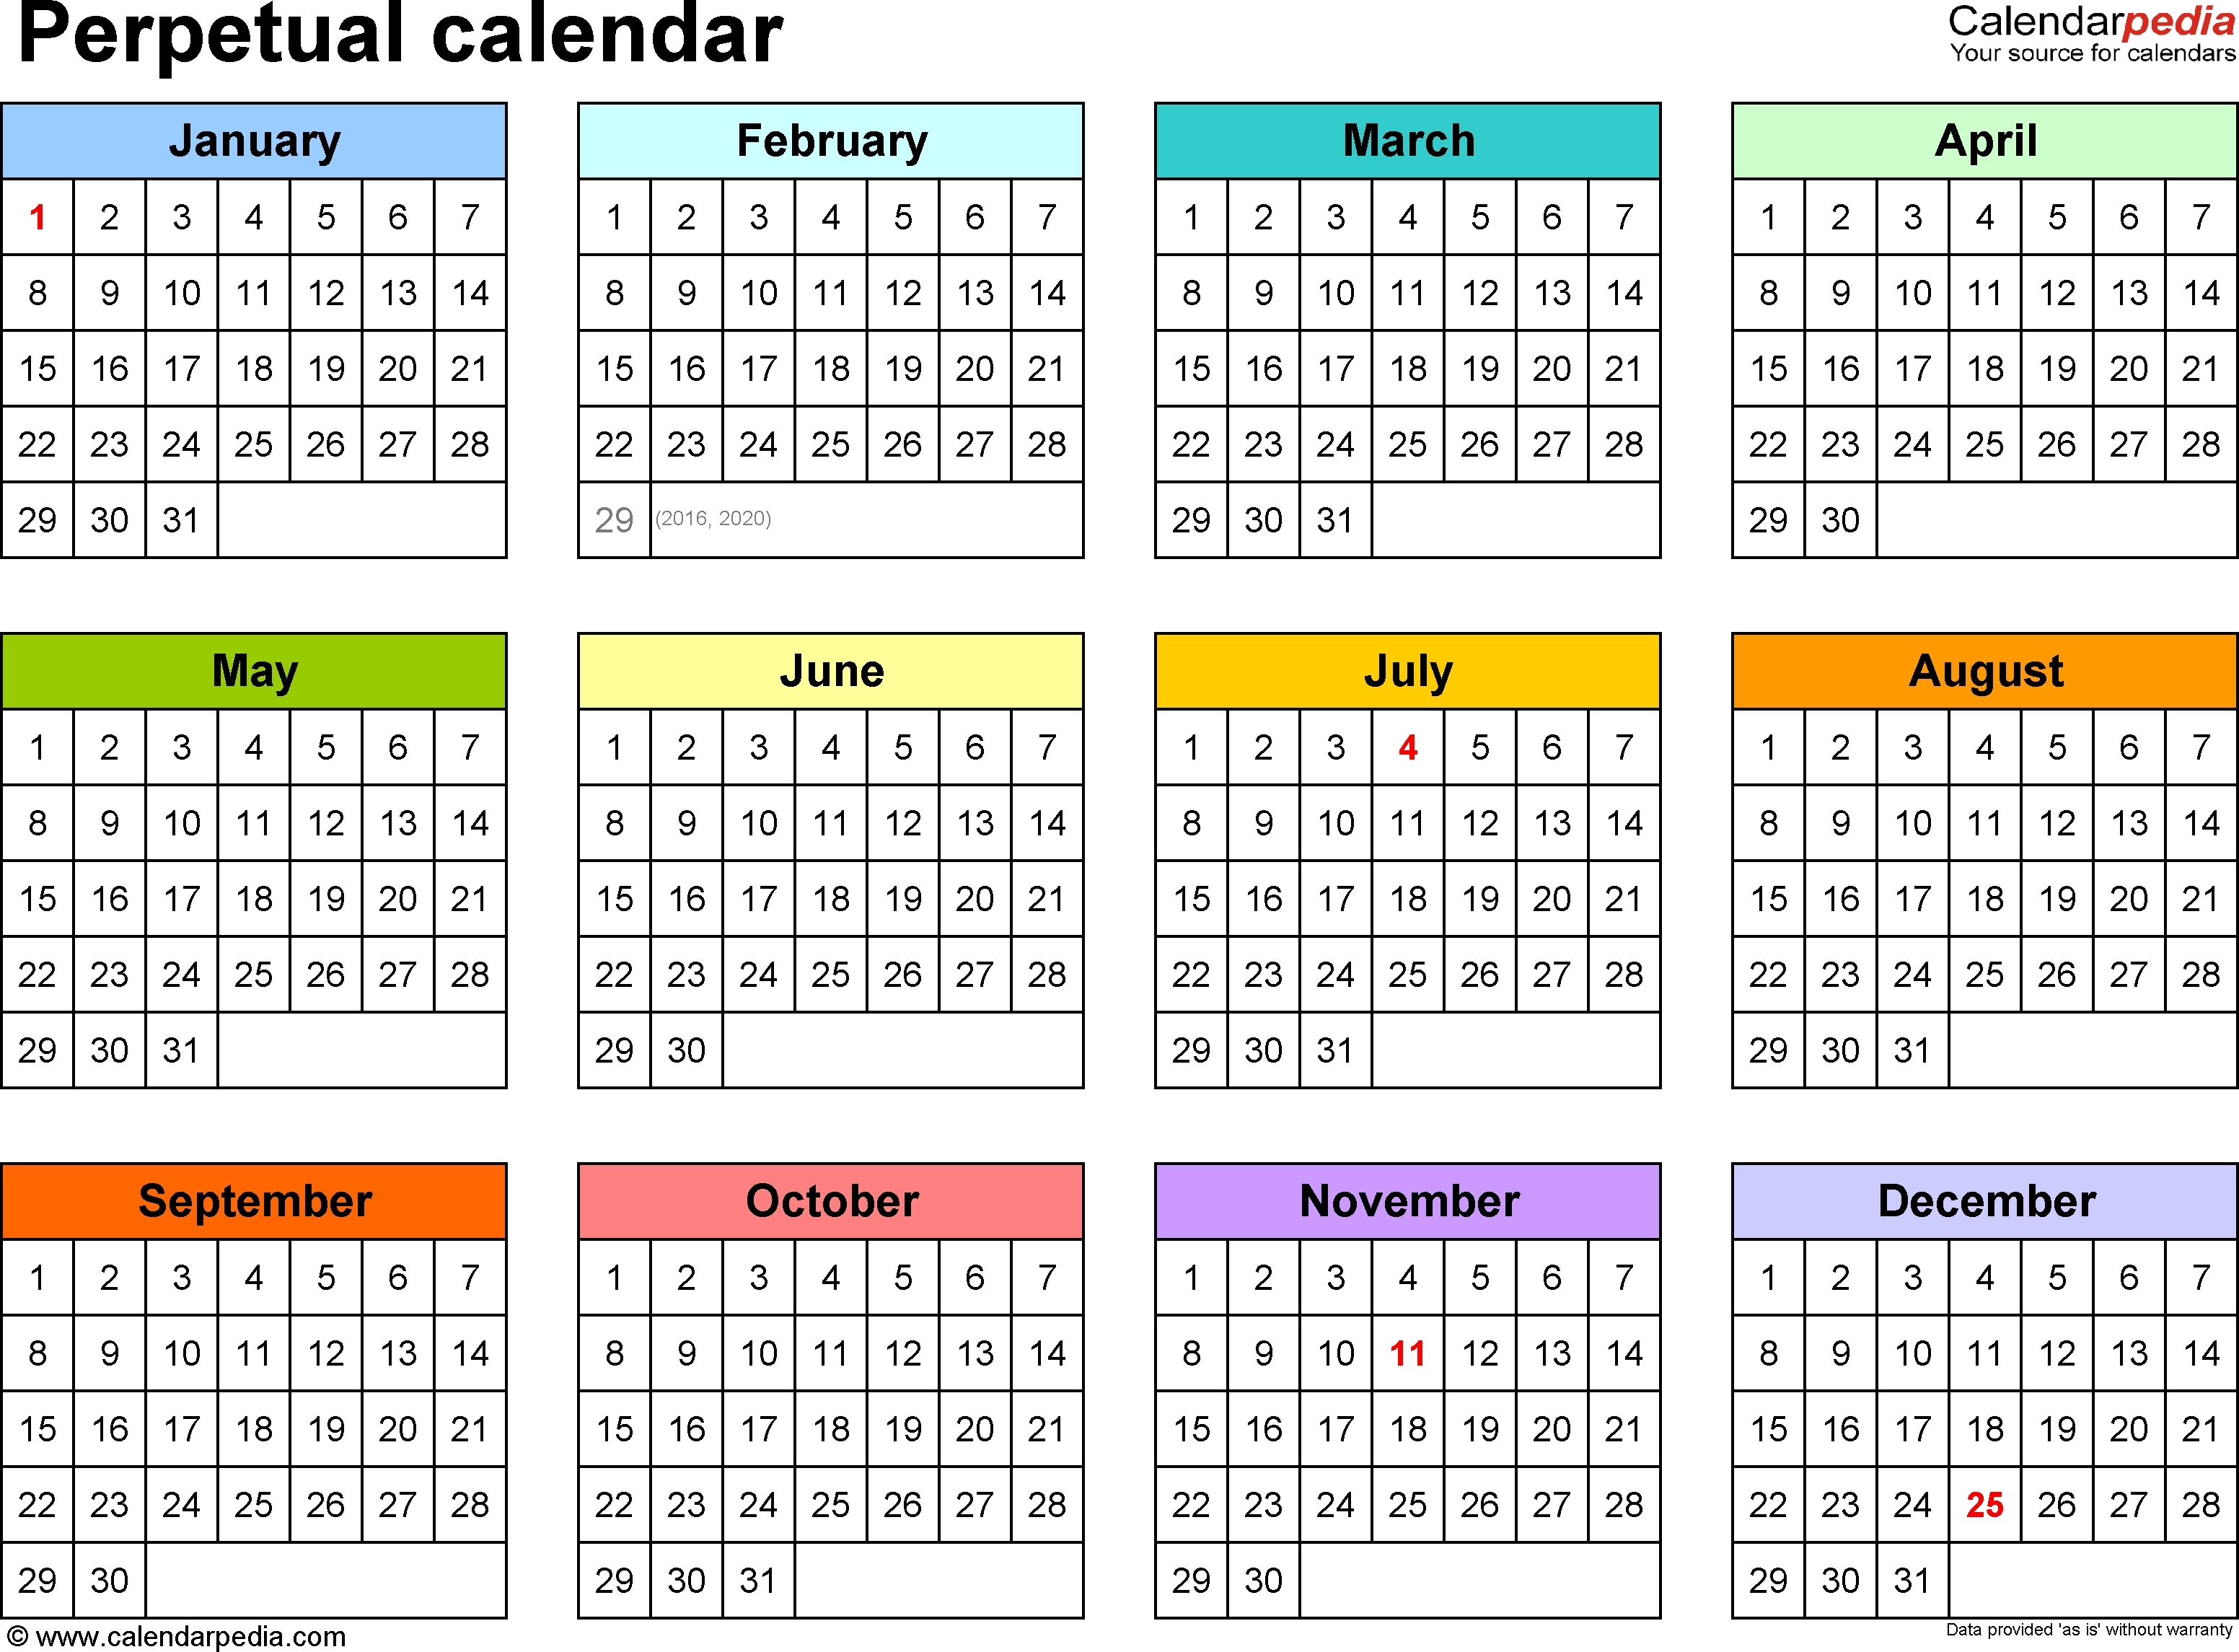 Calendar Printing Online Free | Calendar Design Ideas_Calendar Printing Online Free